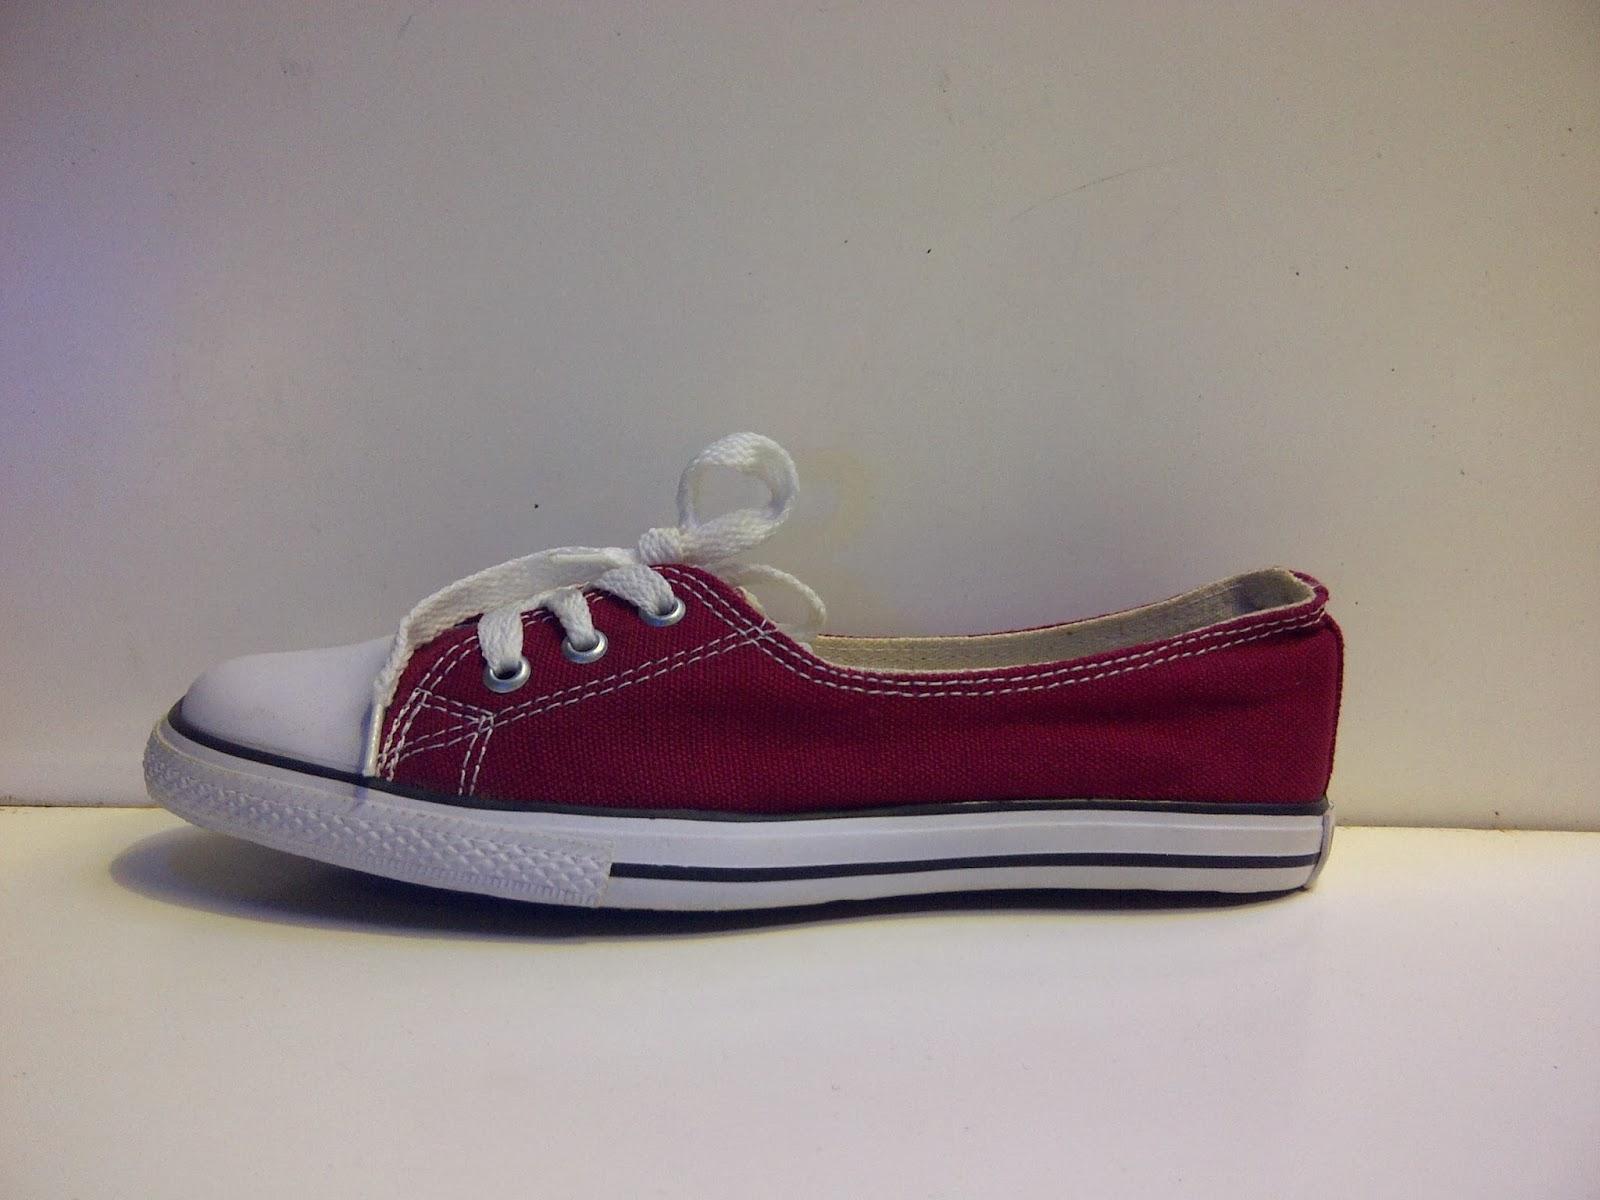 Sepatu Converse Slop Women's merah murah